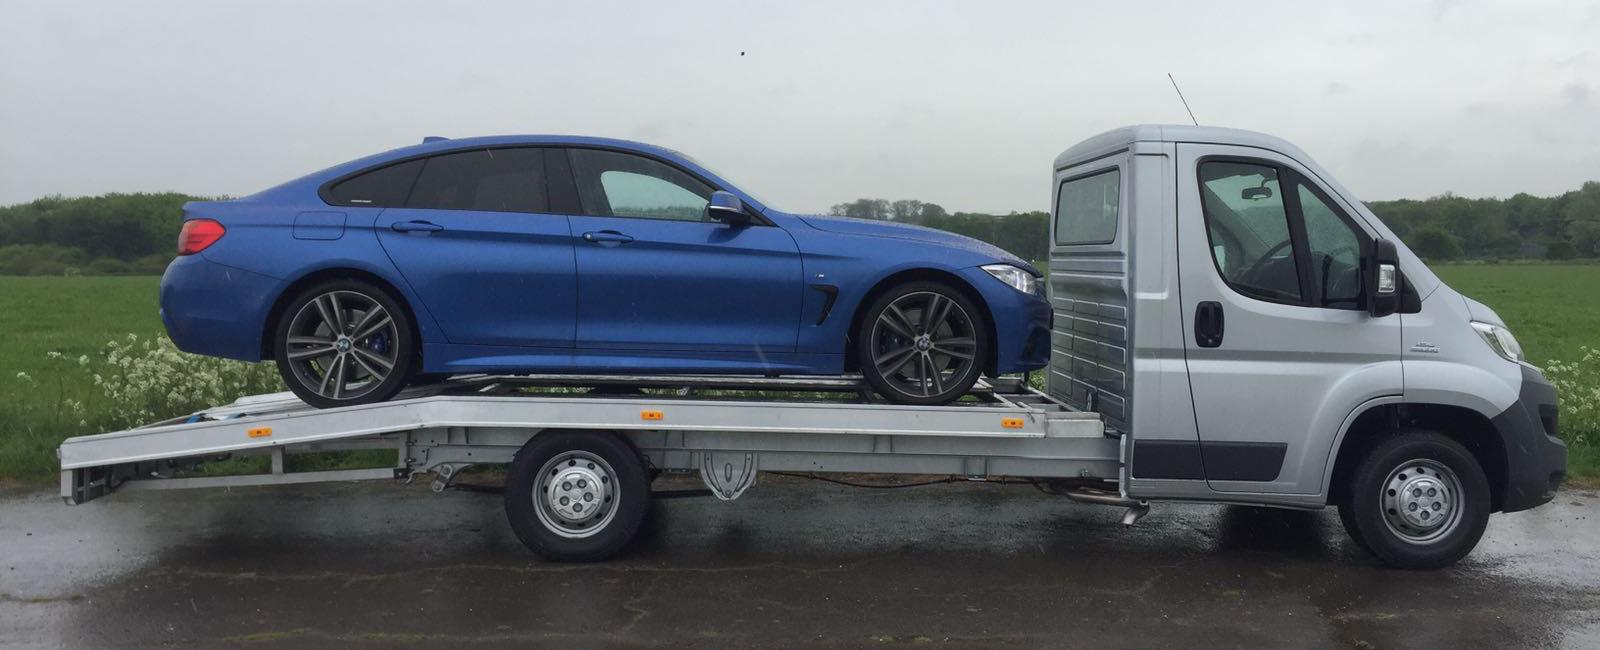 3.5t Transporter - Loaded - Blue Car